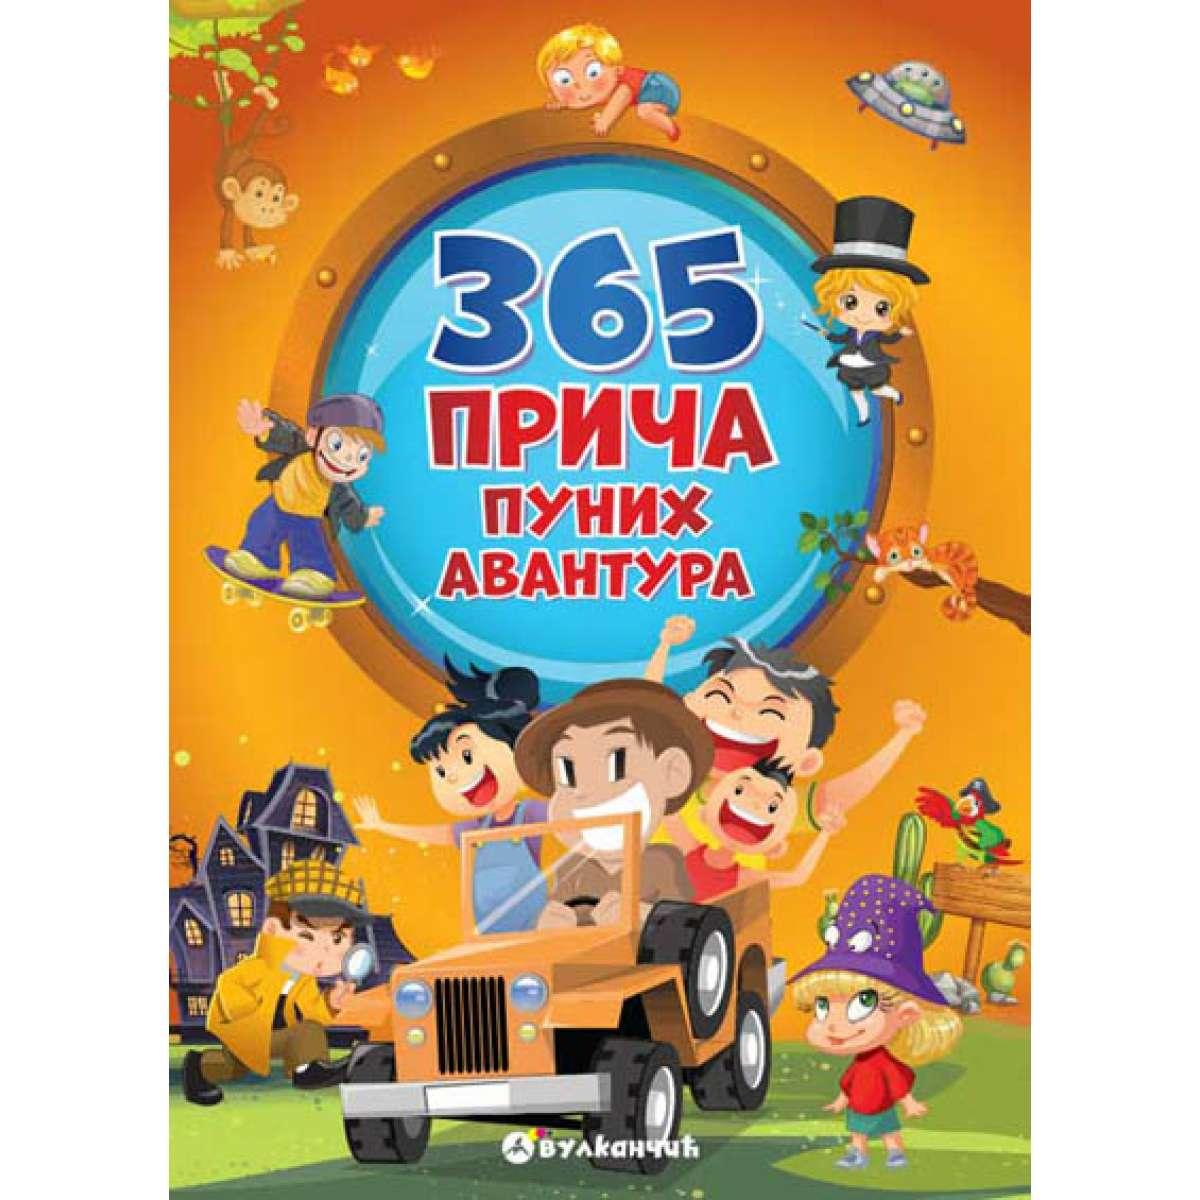 365 PRIČA PUNIH AVANTURA